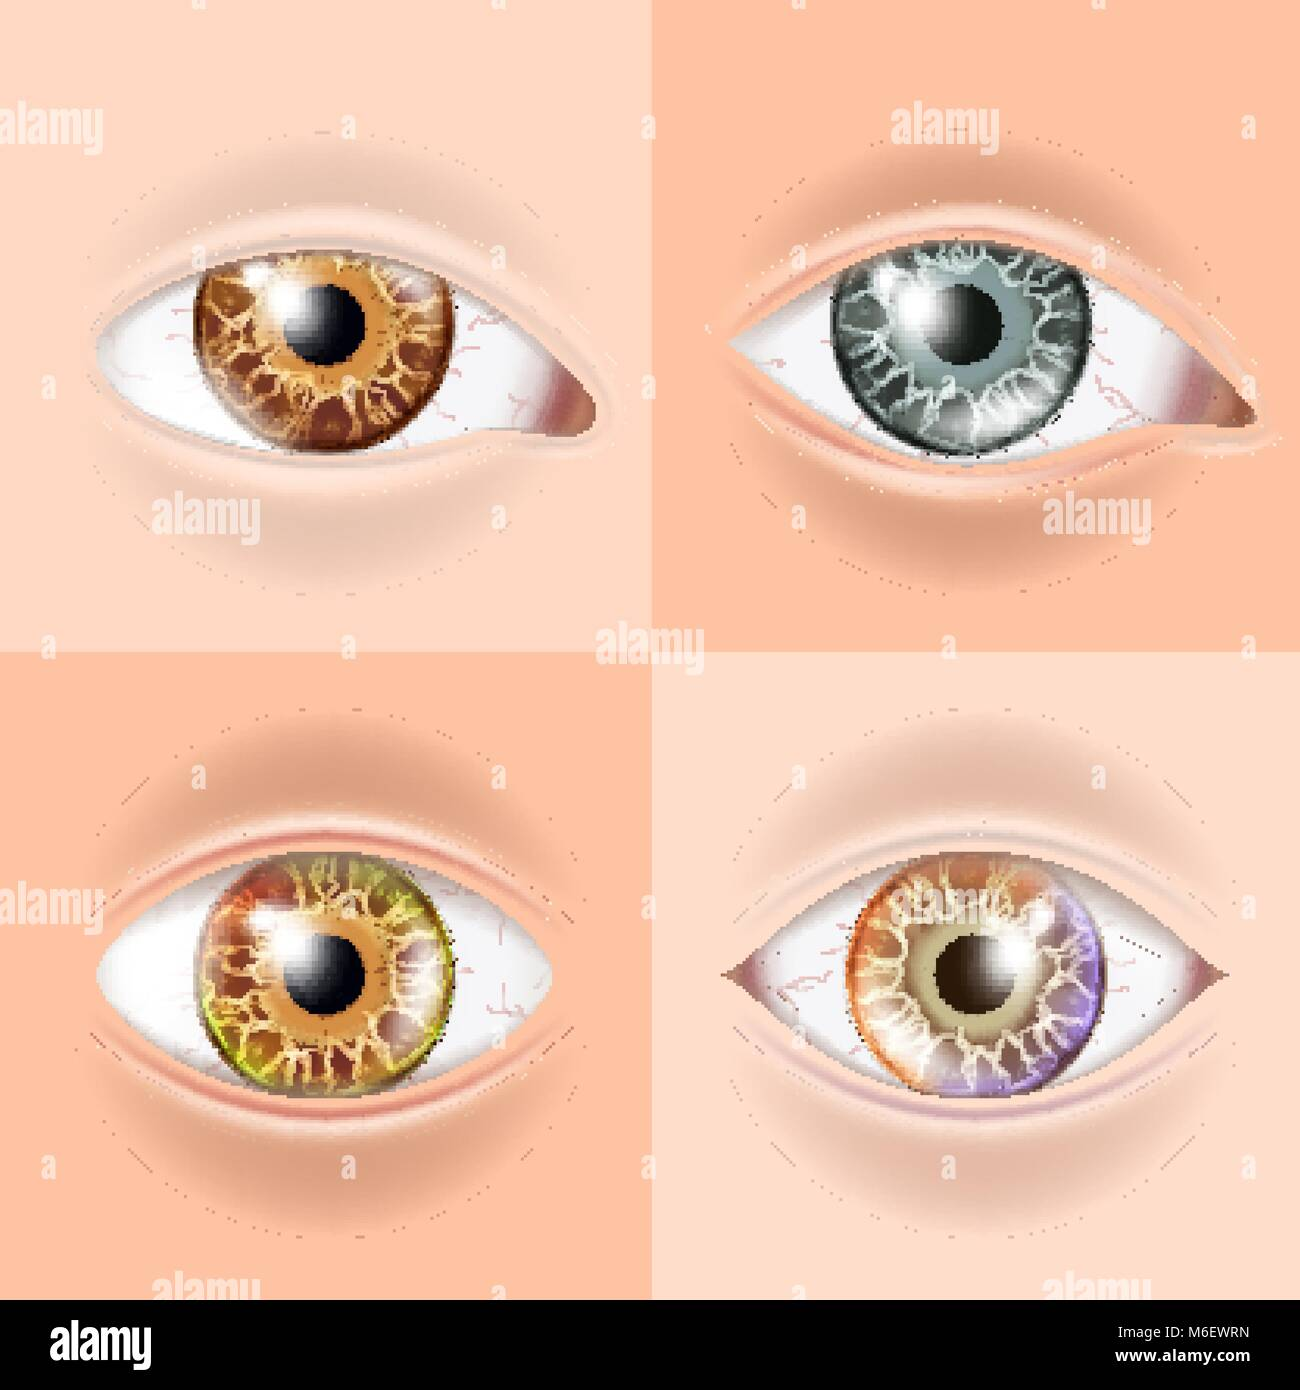 Ojo Humano Establezca Vector. Concepto de visión. Médicos de ...